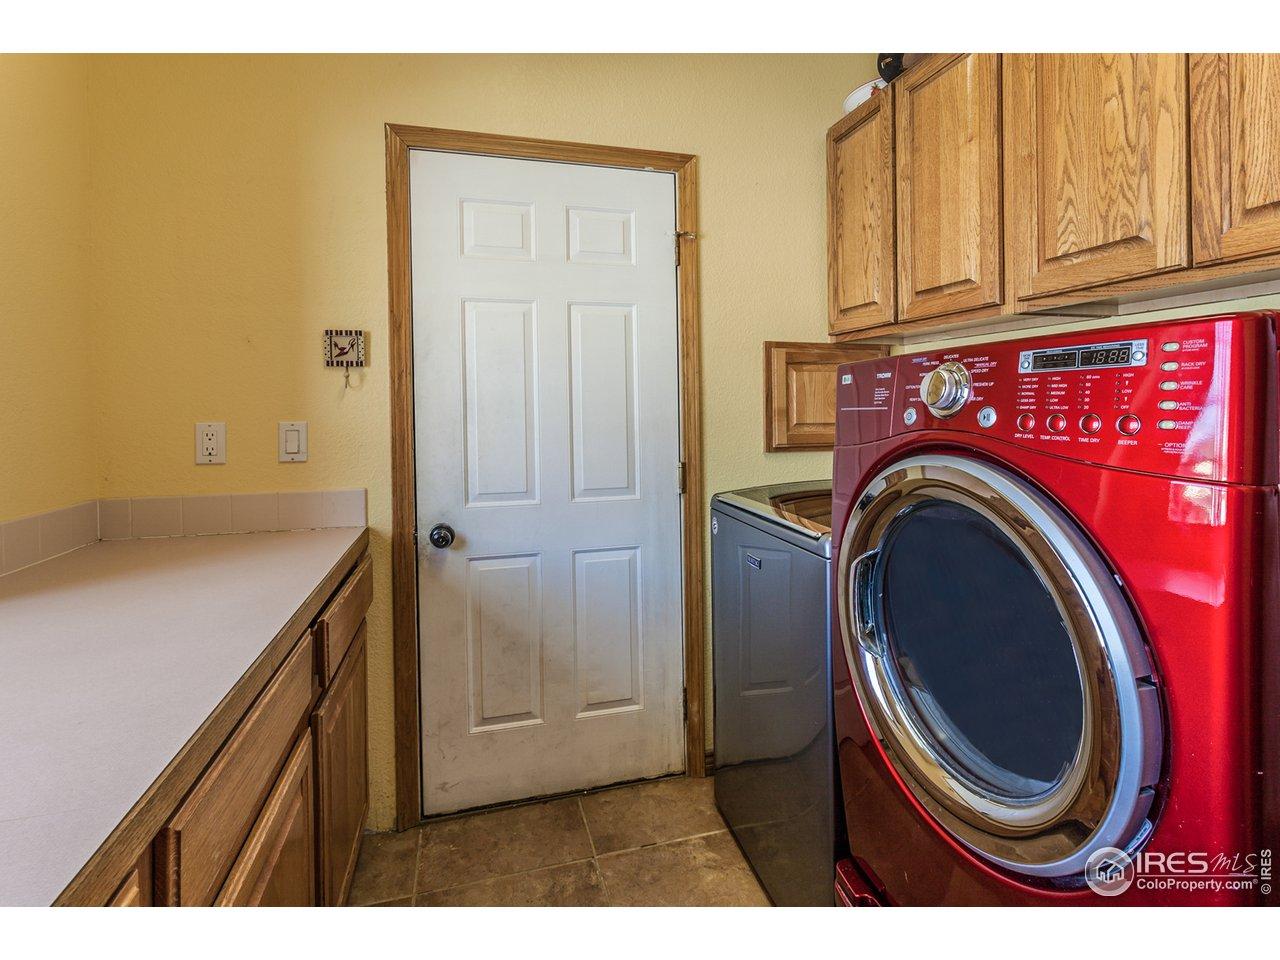 Laundry room on main level